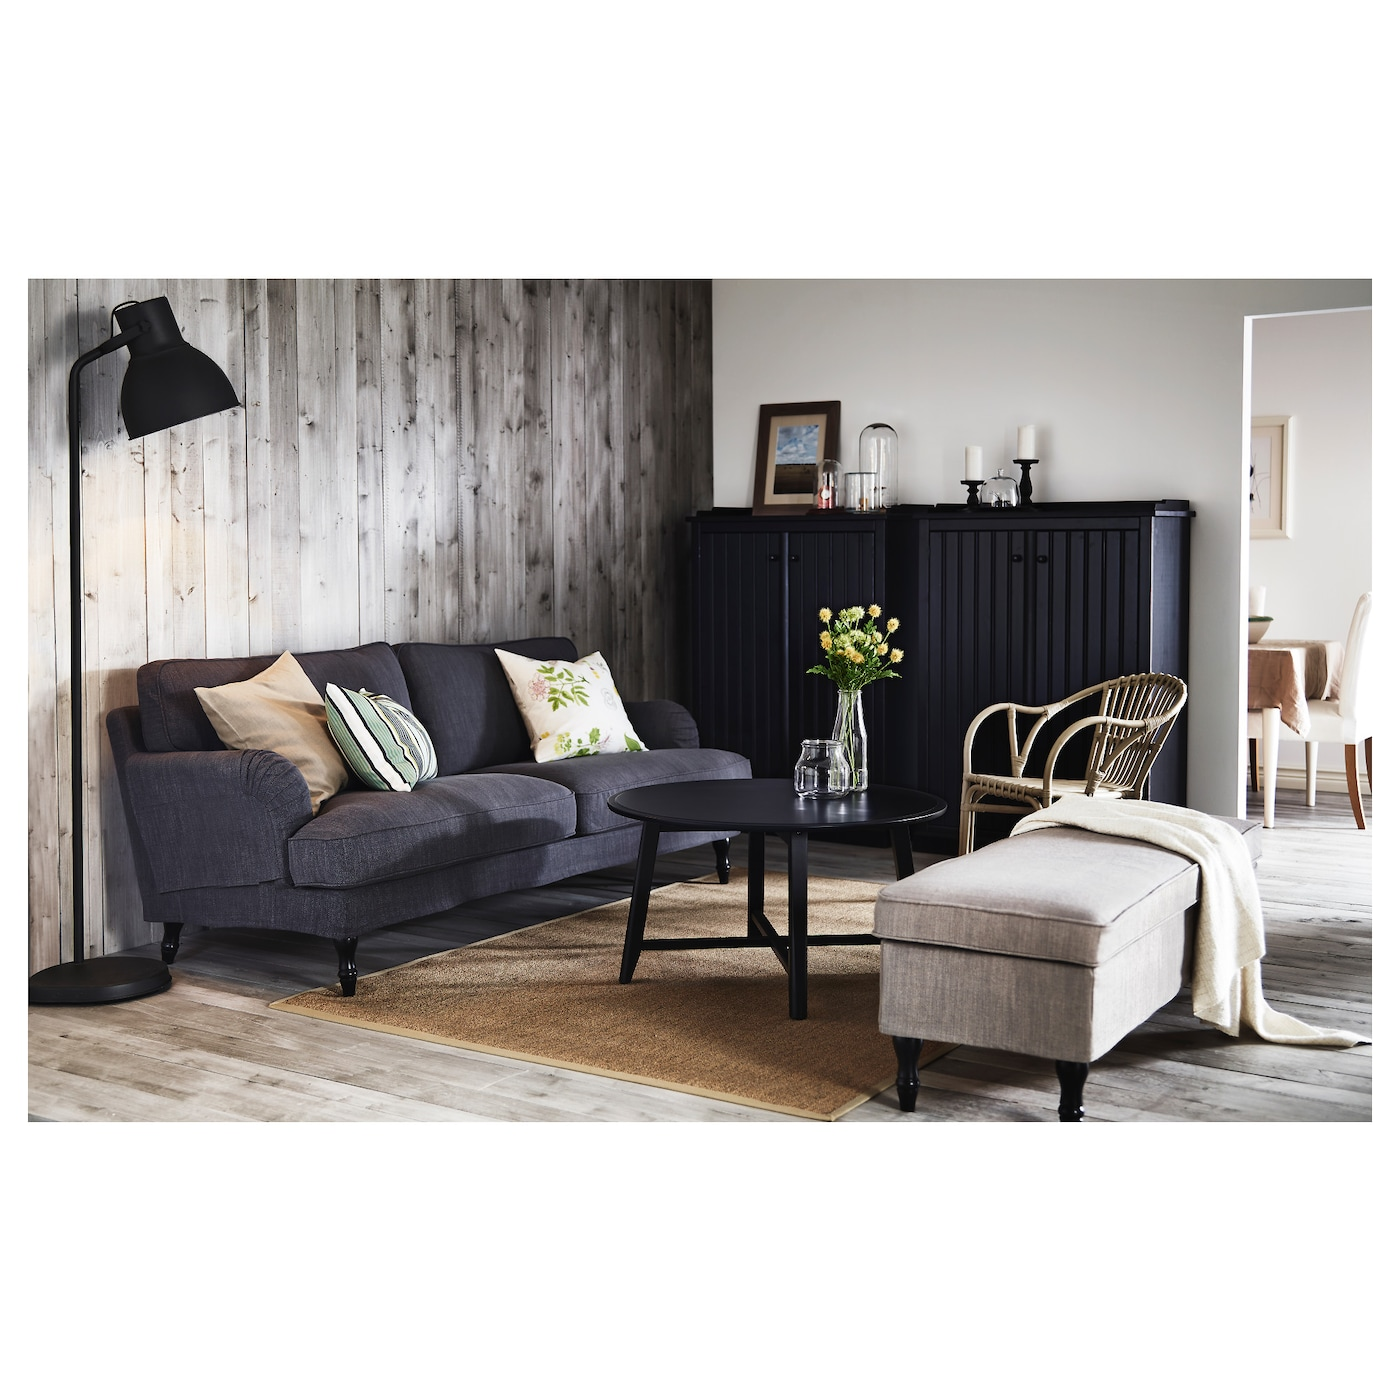 stocksund three-seat sofa nolhaga dark grey  black  wood